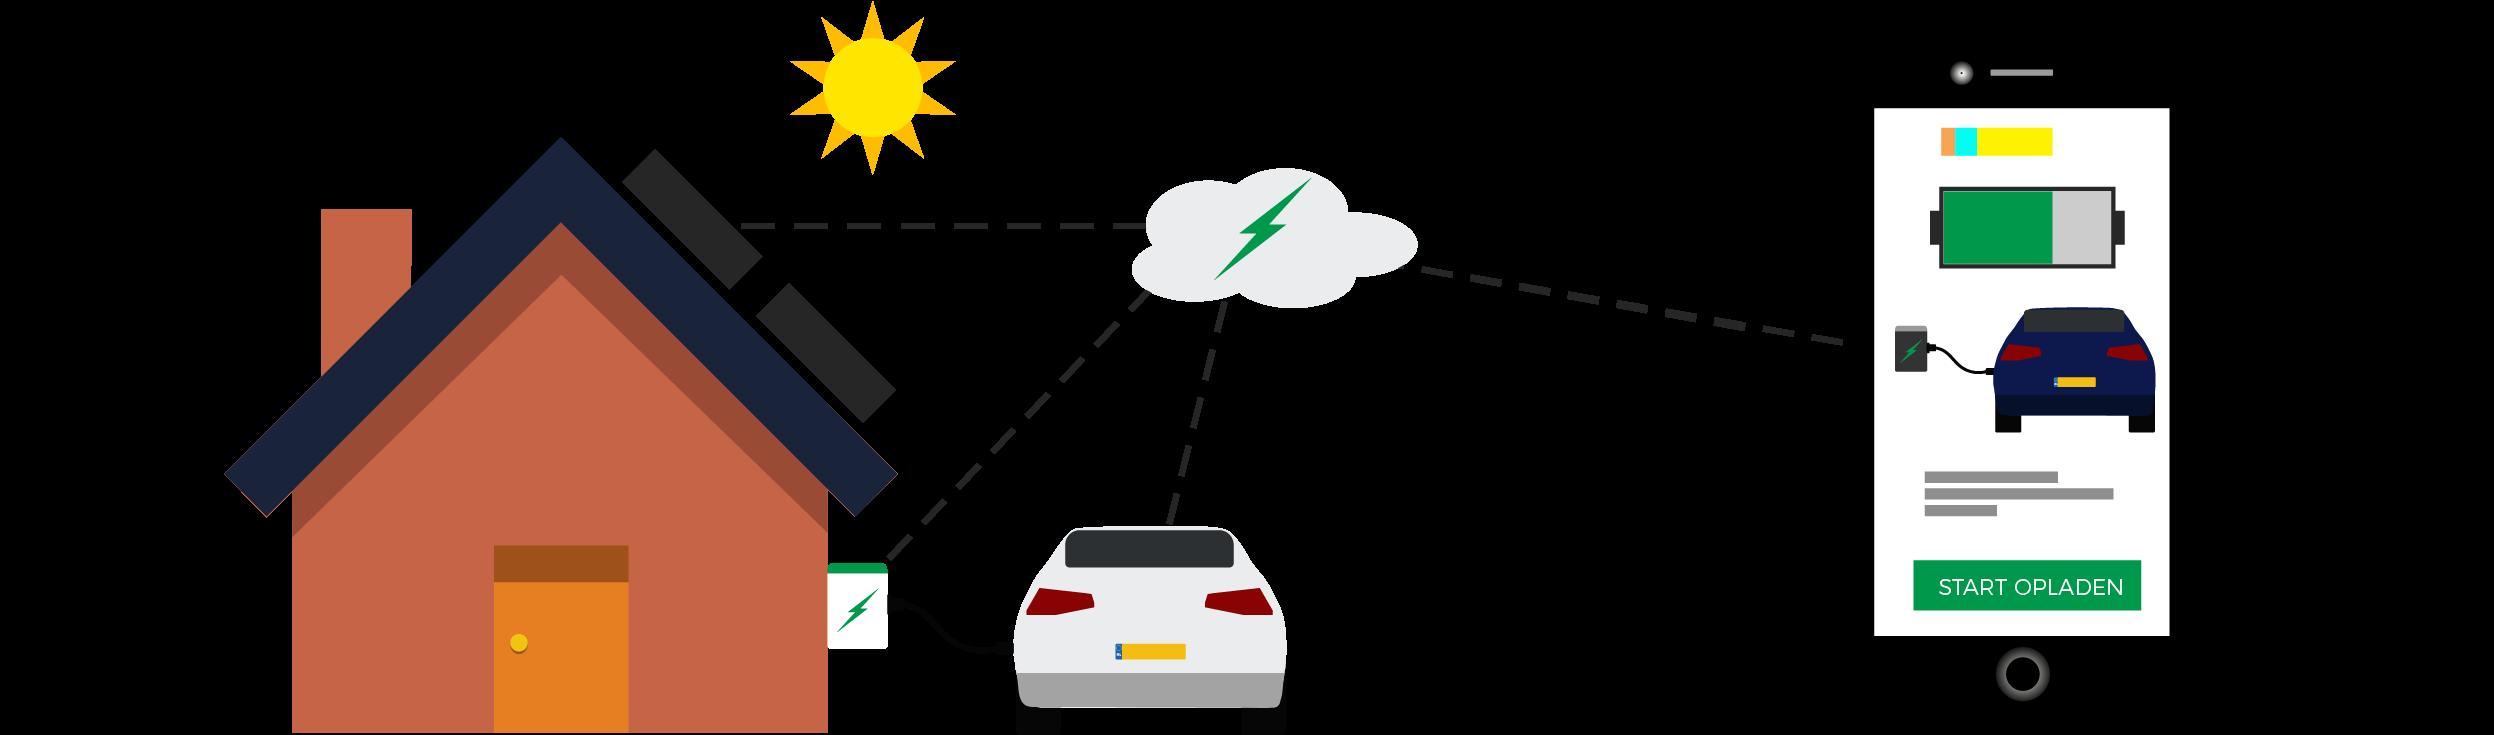 Elektrische Auto Opladen The Basics Mountox